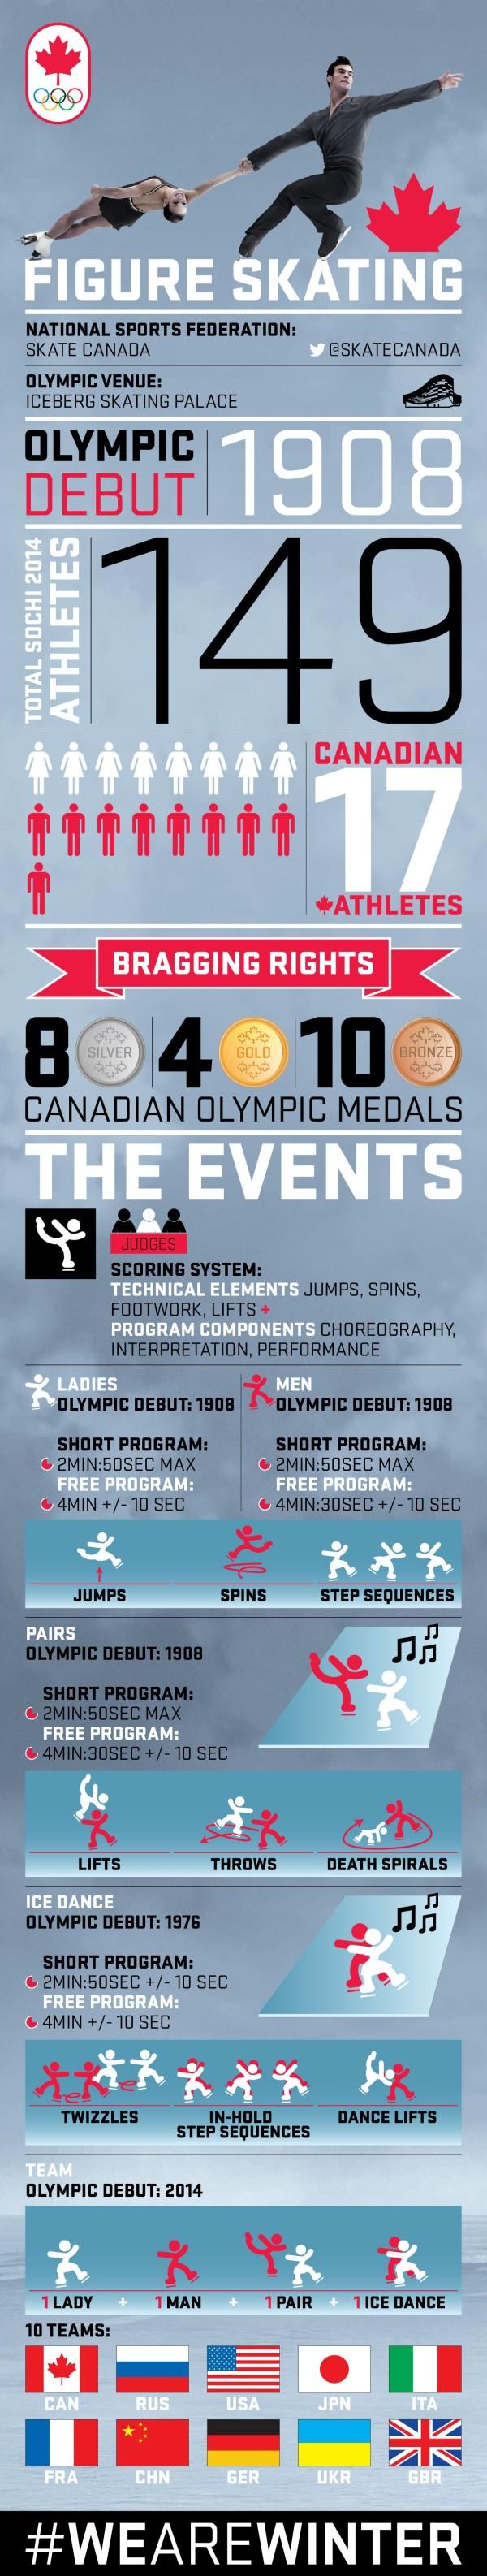 SochiWinterOlympicsCanadianFigureSkatingInfographic